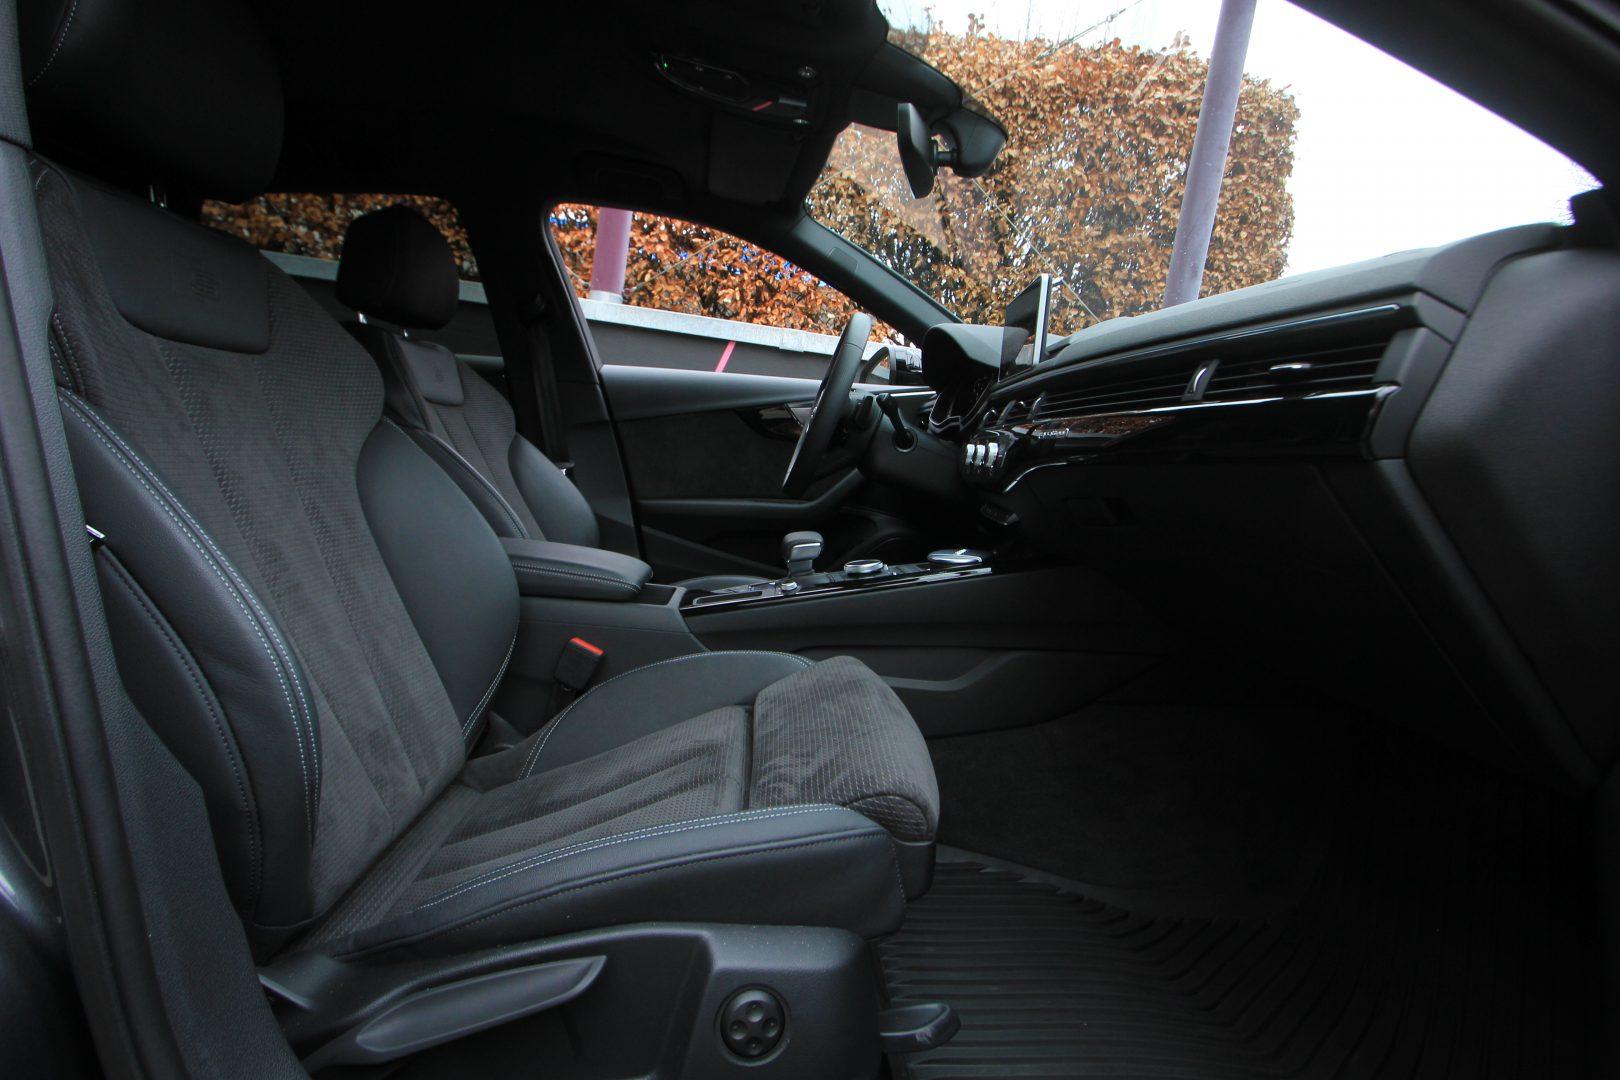 AIL Audi A4 Avant S line Sport / Plus quattro 3.0 TDI 3